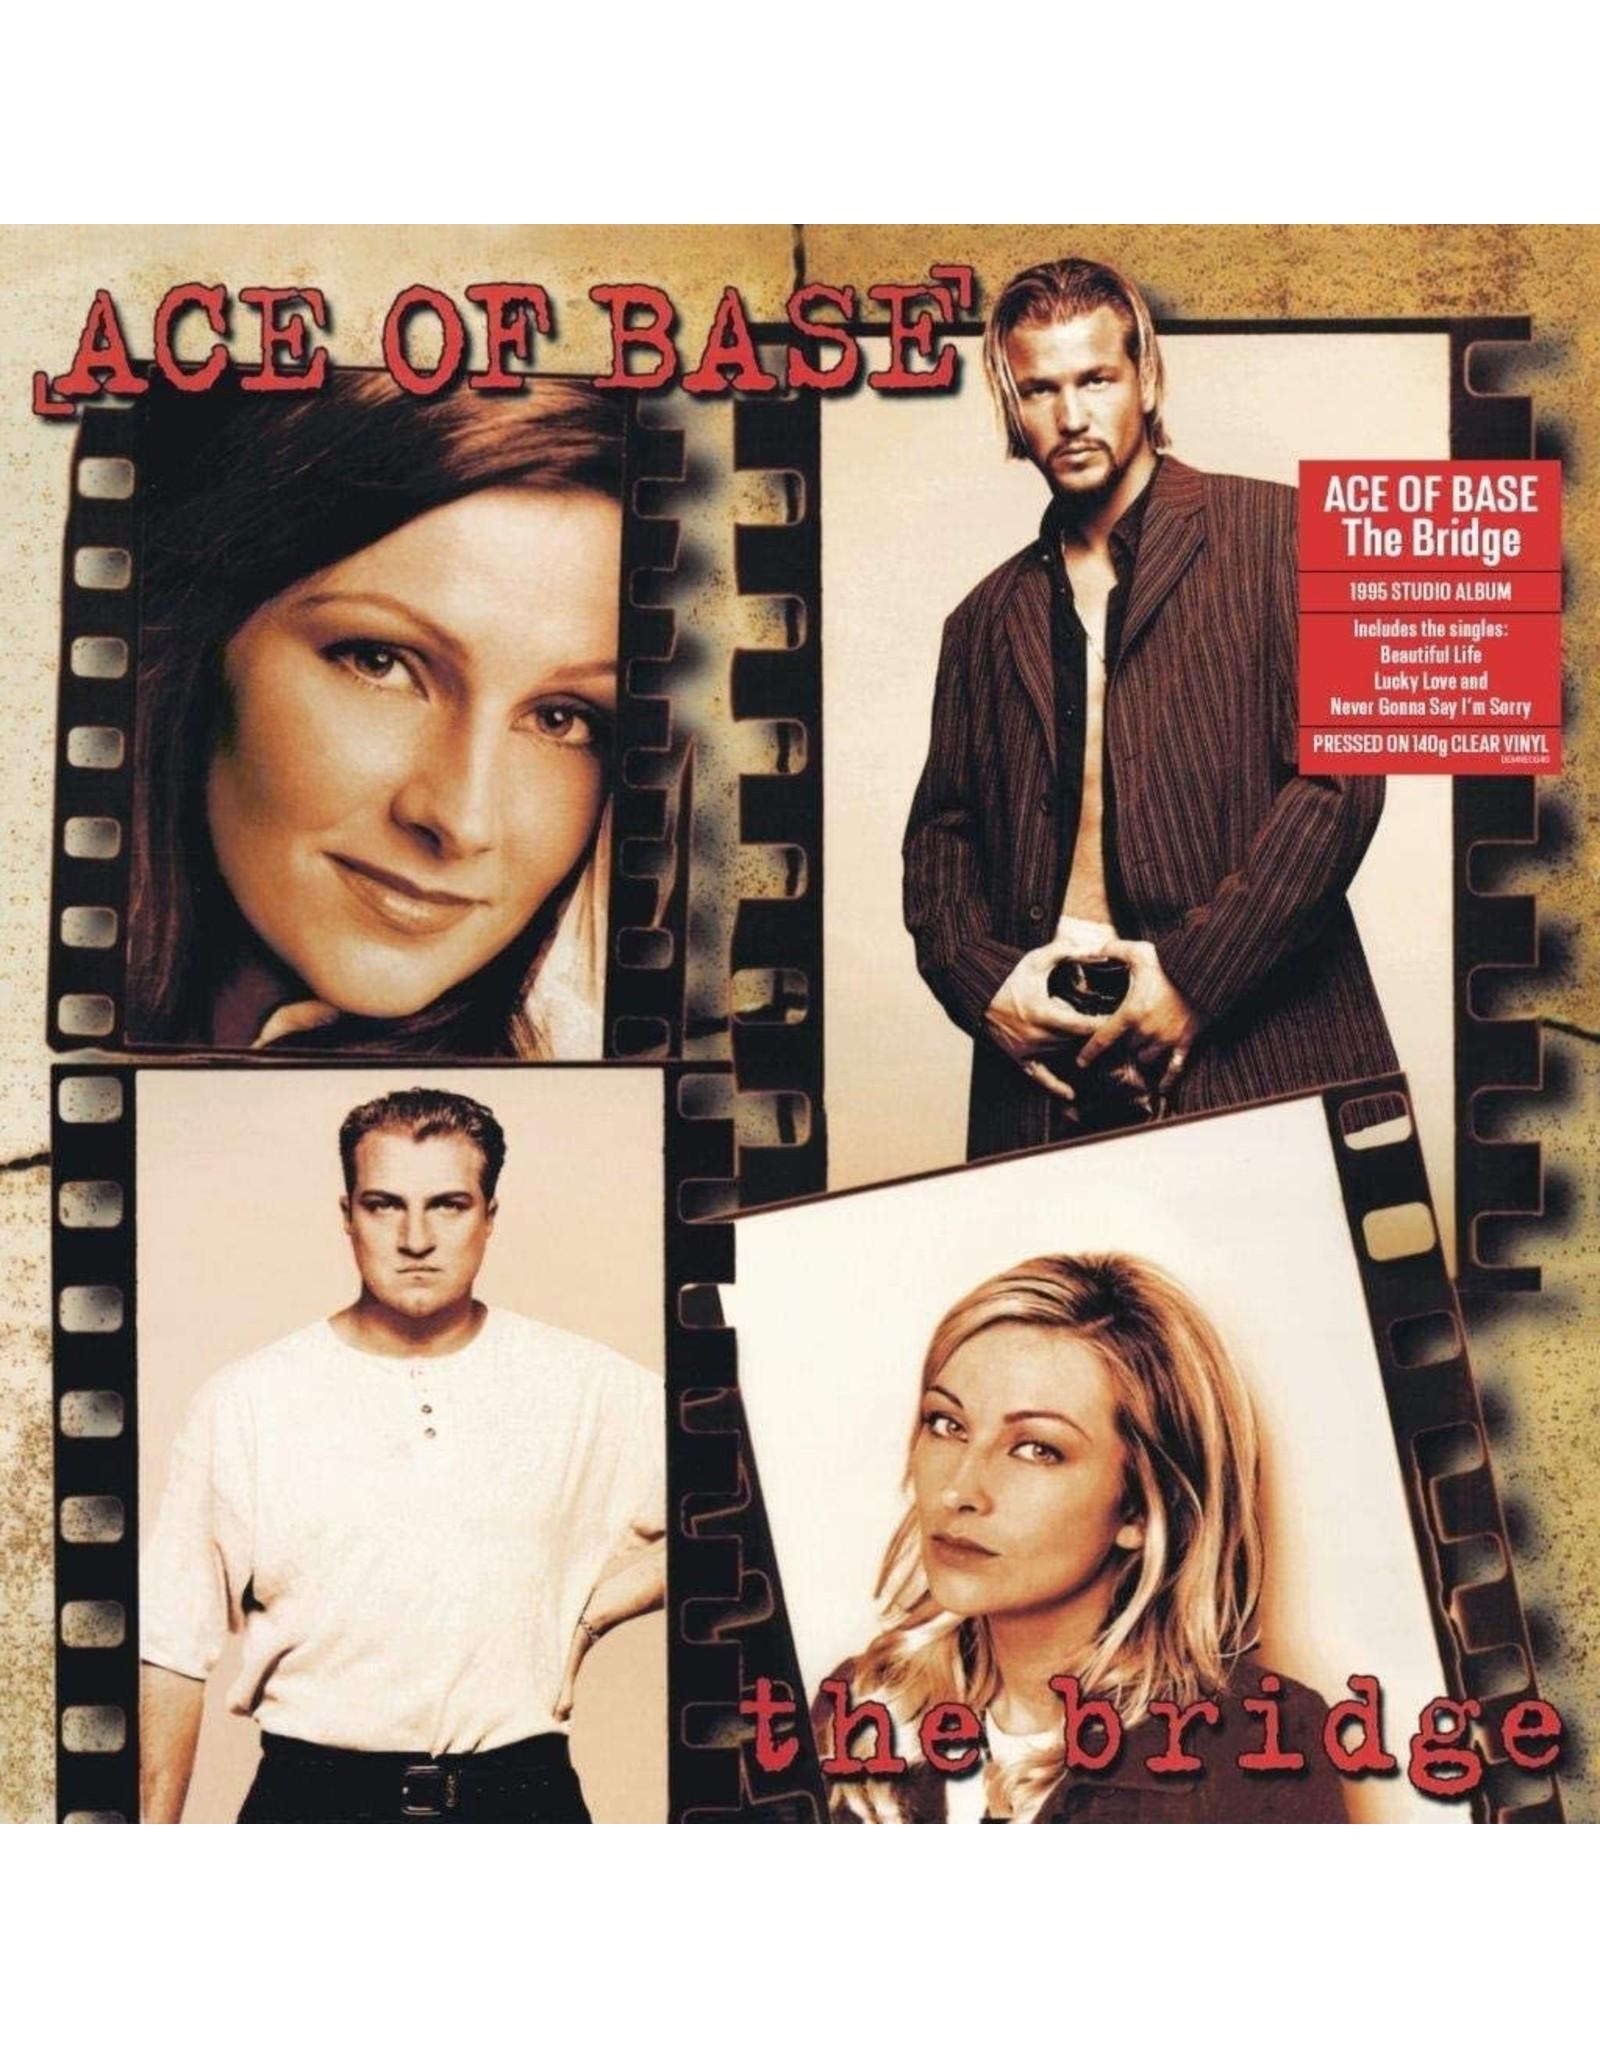 Ace of Base - The Bridge (Clear Vinyl)